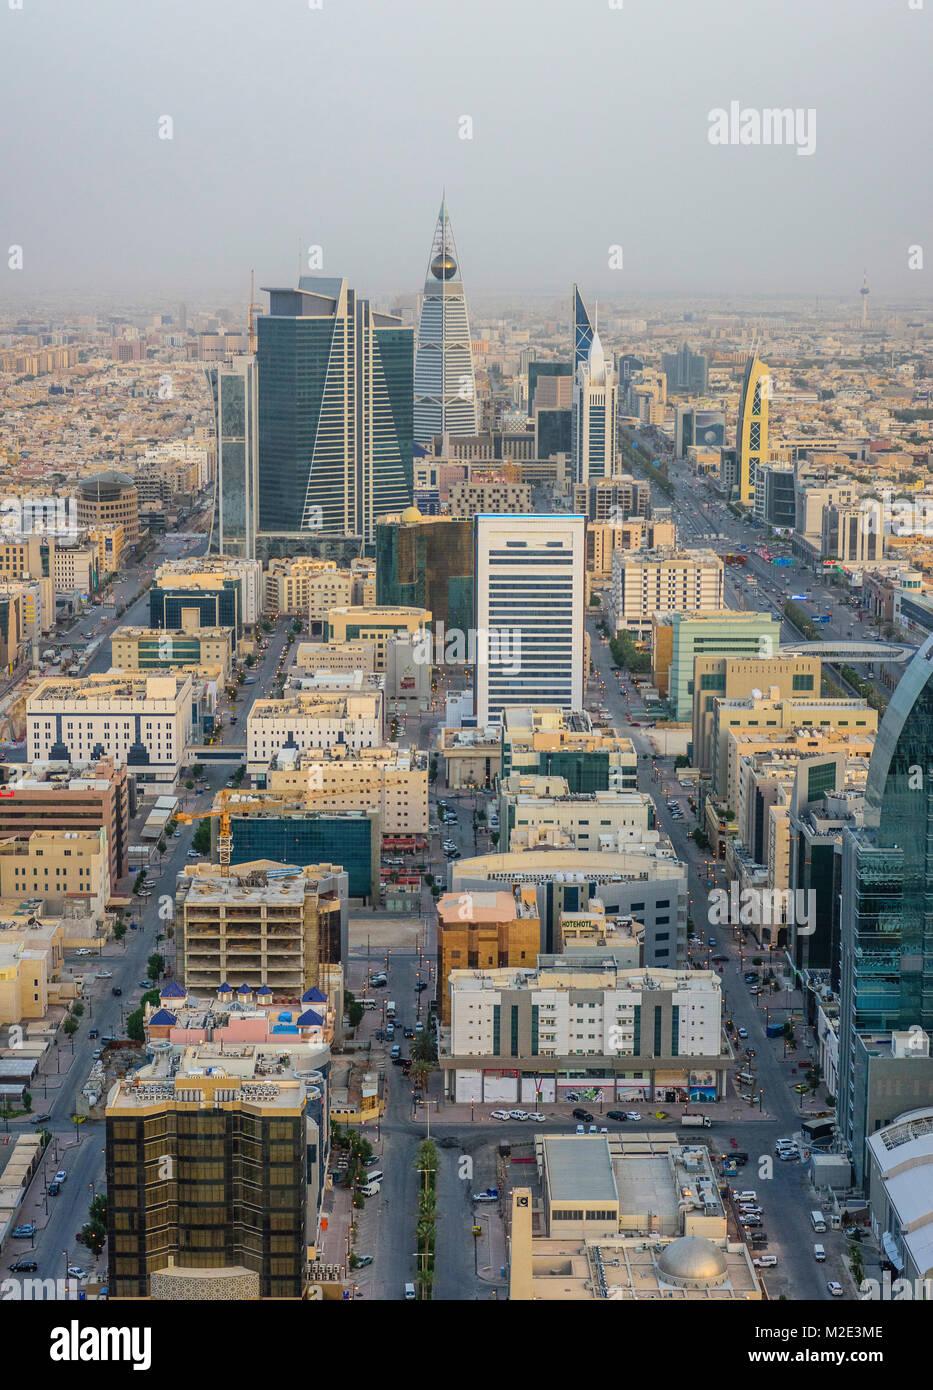 "'Vista aerea del paesaggio urbano, Riyadh, Arabia Saudita"" Immagini Stock"